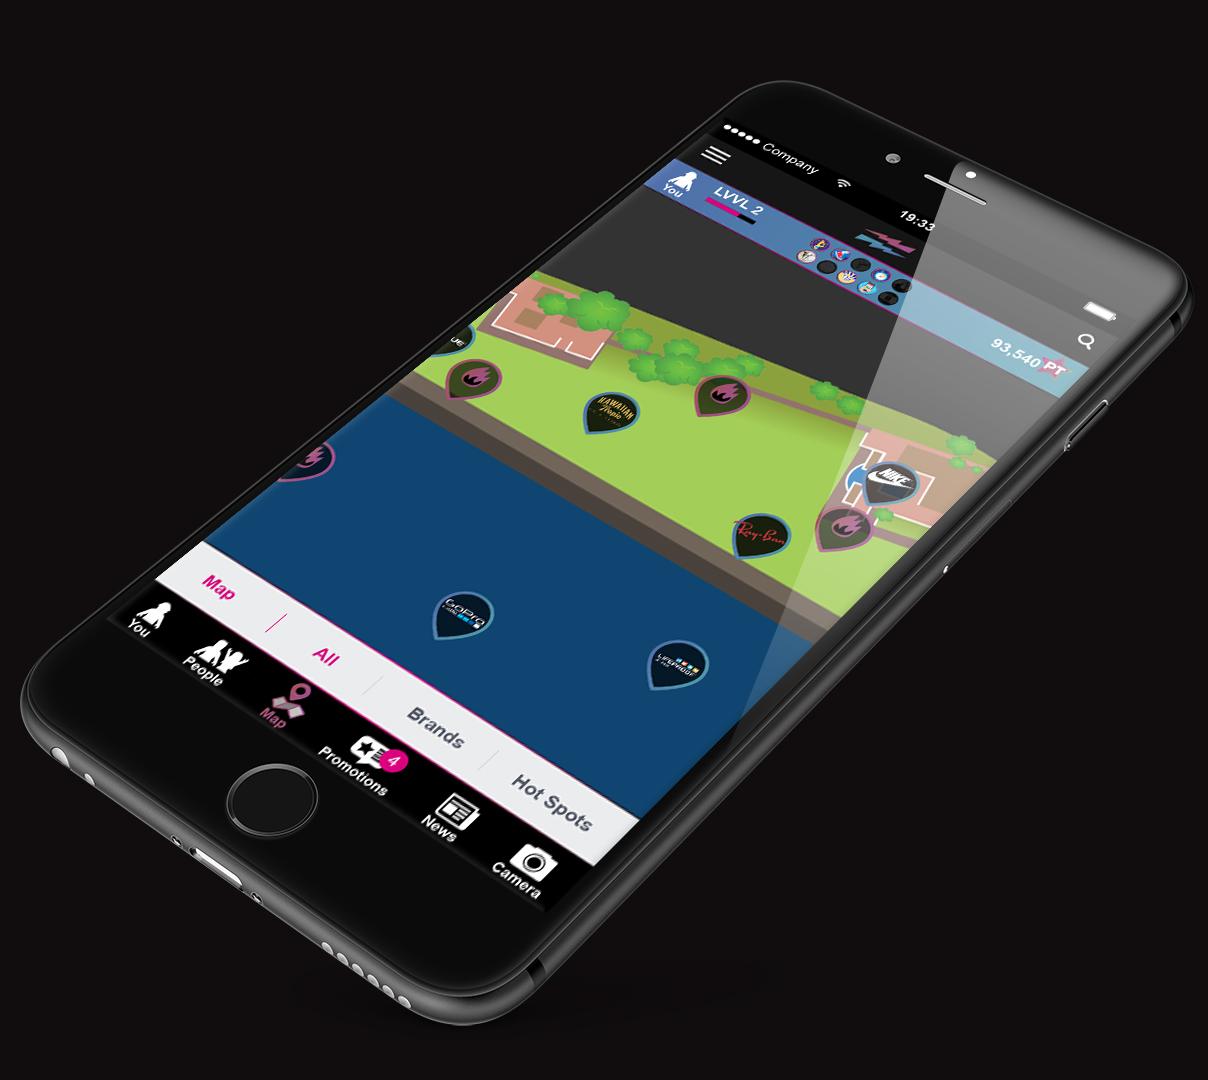 LEVVEL iPhone_Plus_app_map all.jpg